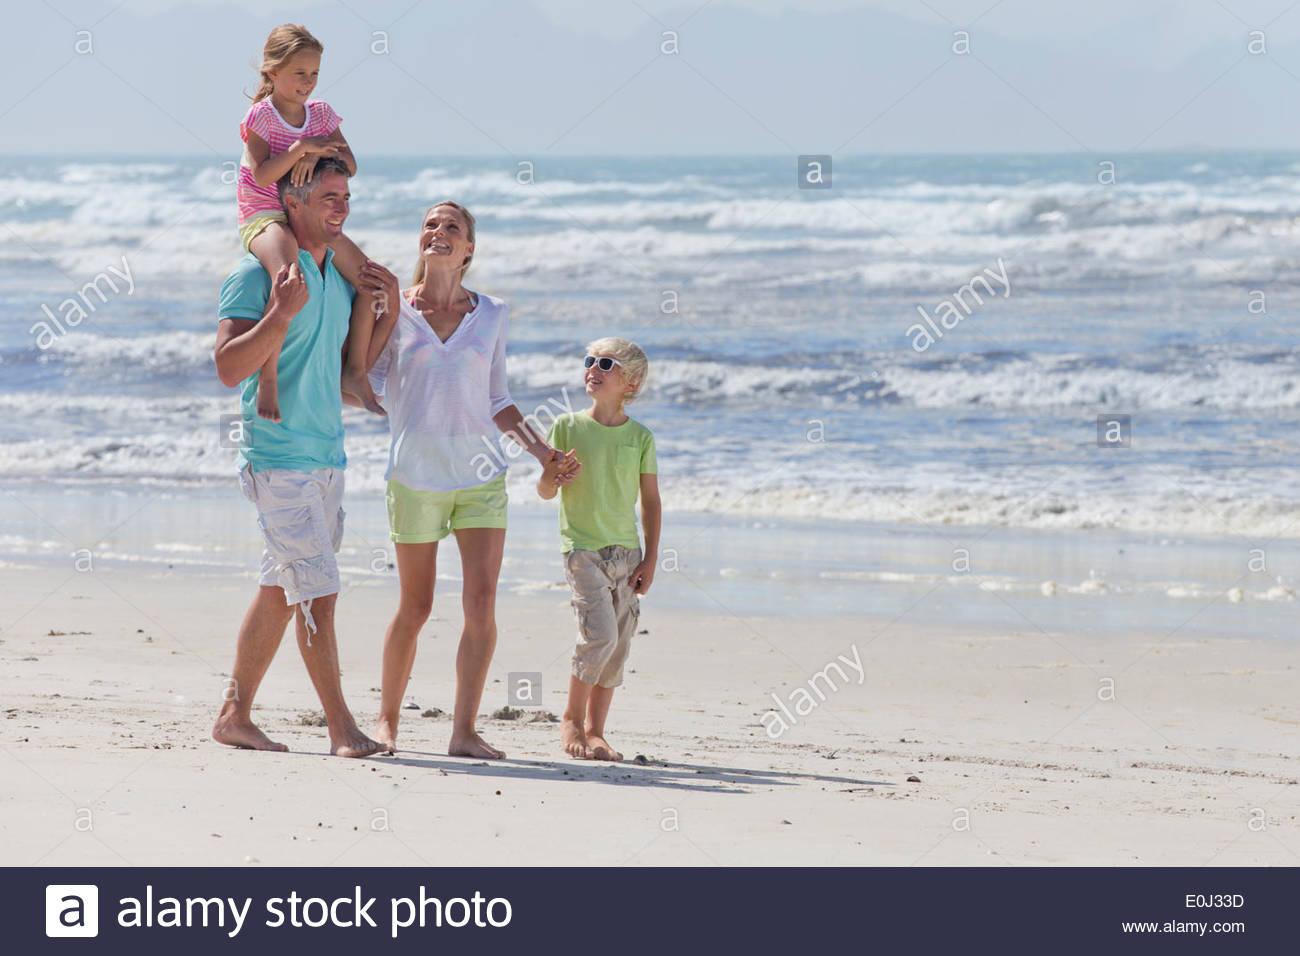 Family walking on sunny beach - Stock Image